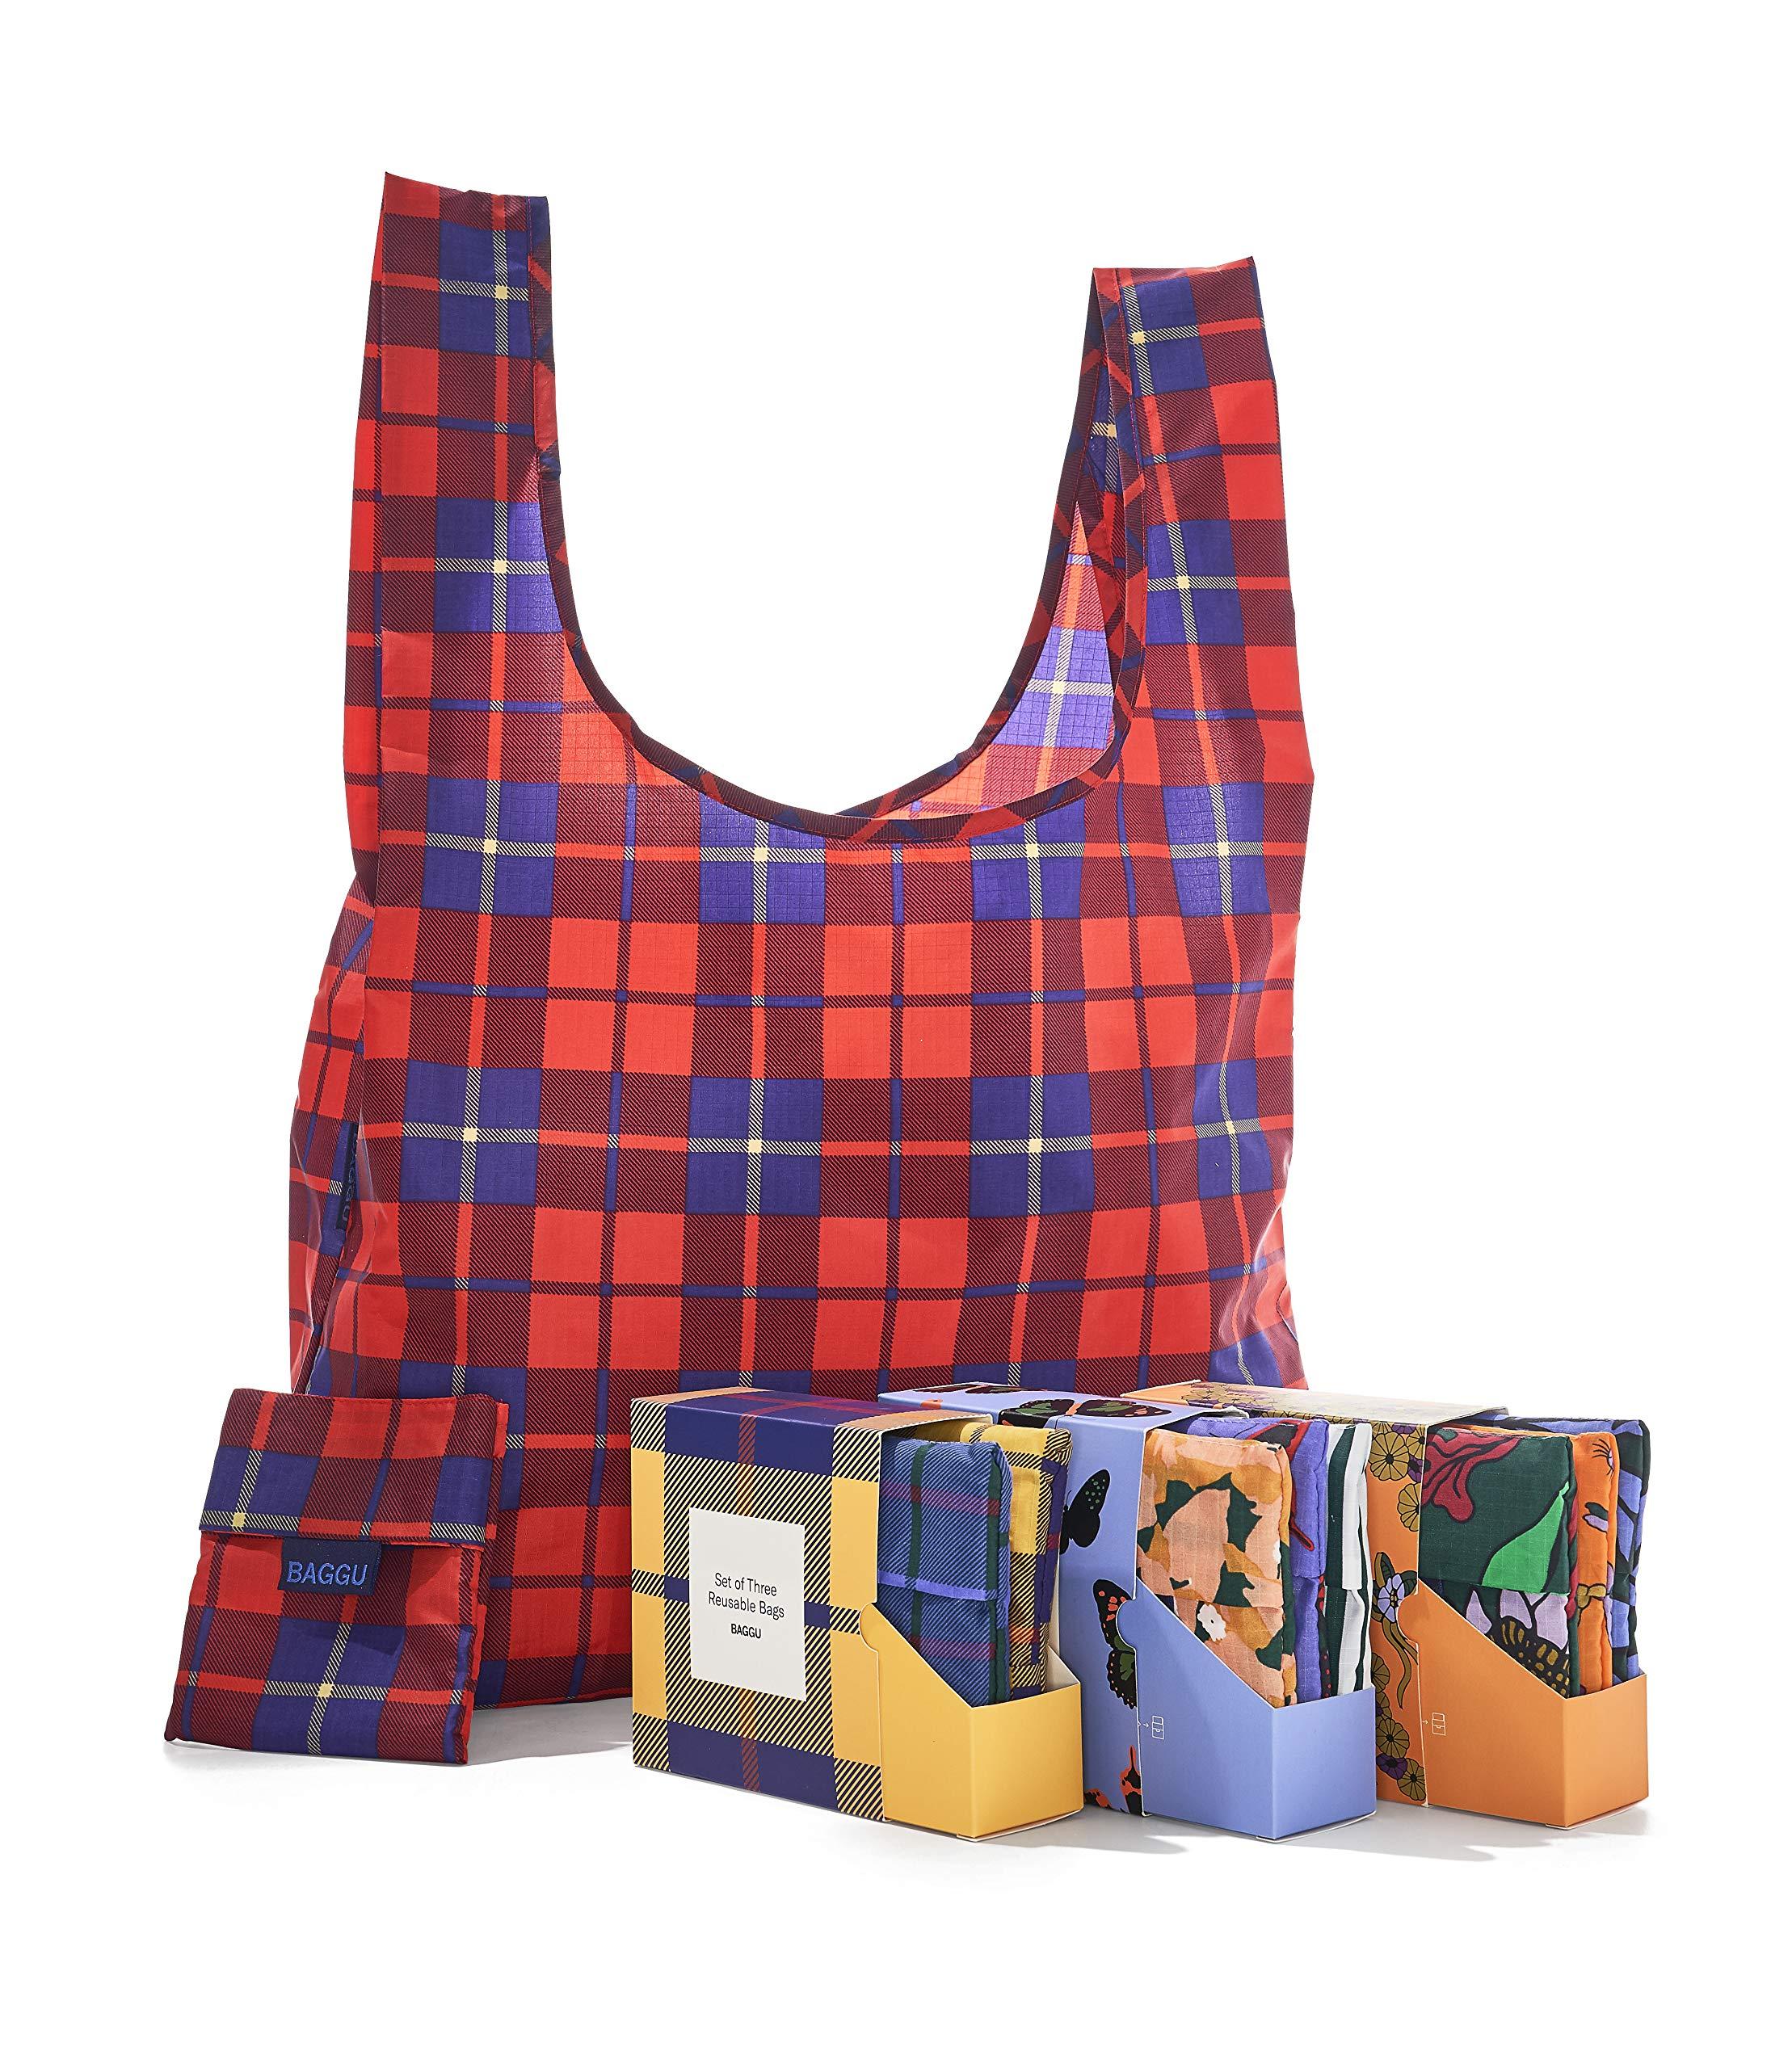 BAGGU Standard Reusable Shopping Bag, Ripstop Nylon Grocery Tote or Lunch Bag, Bronze